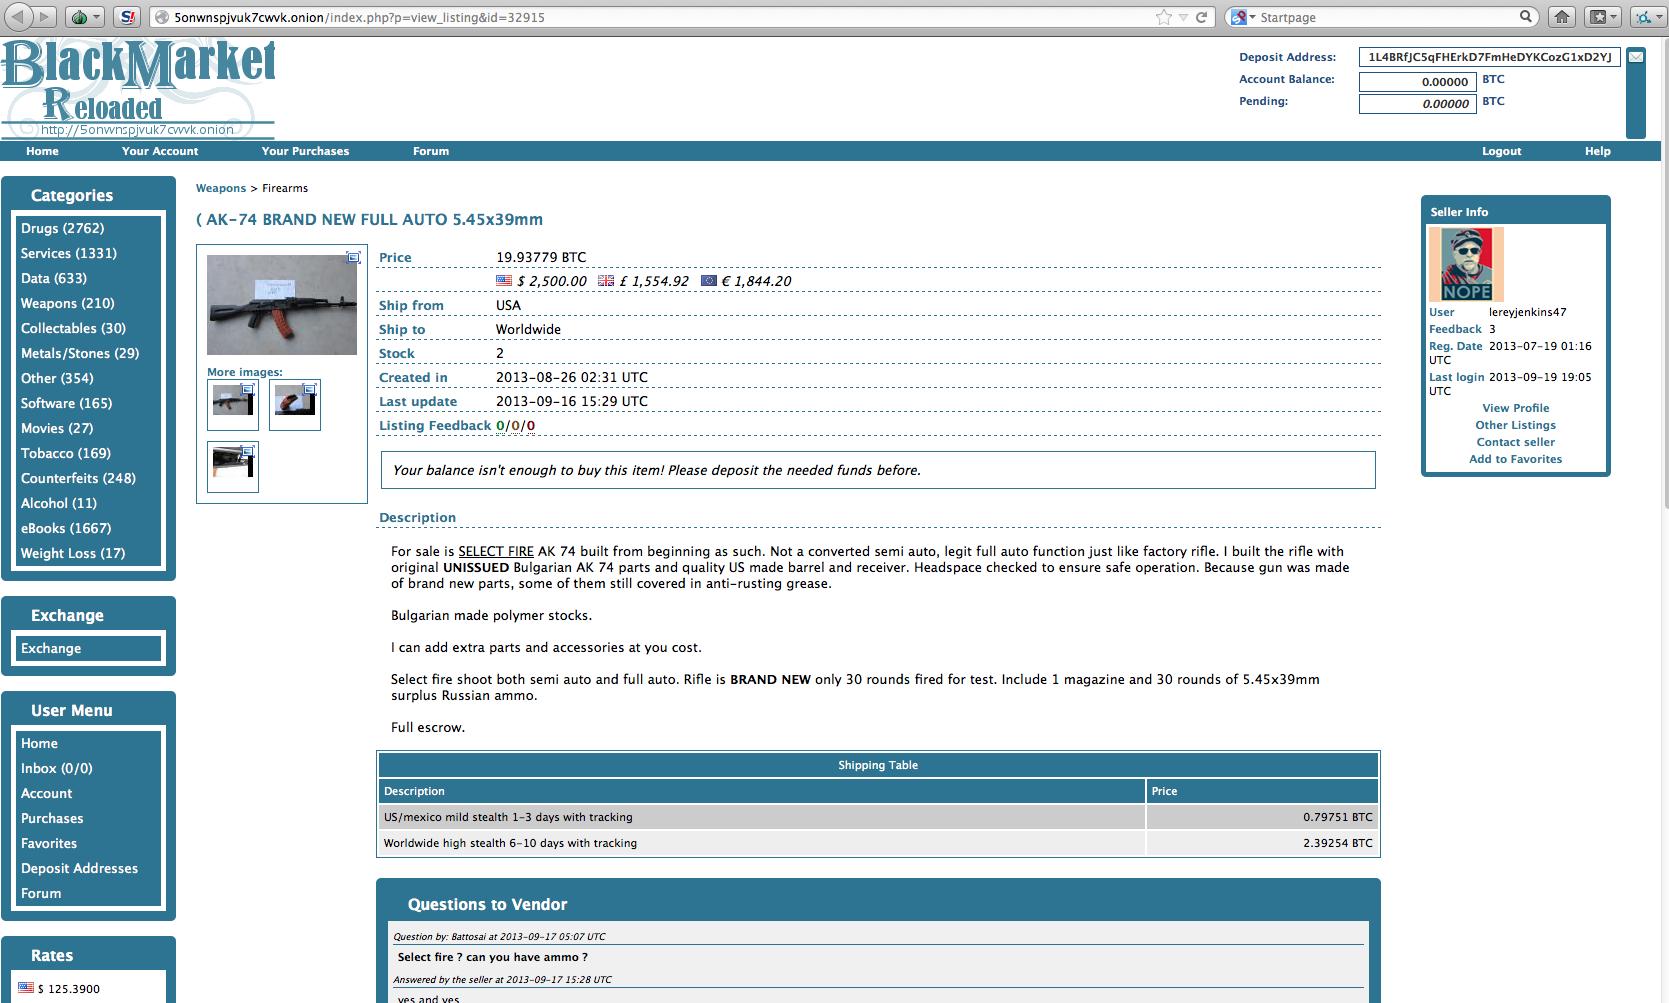 2013-10-16-ScreenShotBlackMarketAK47forsale.png